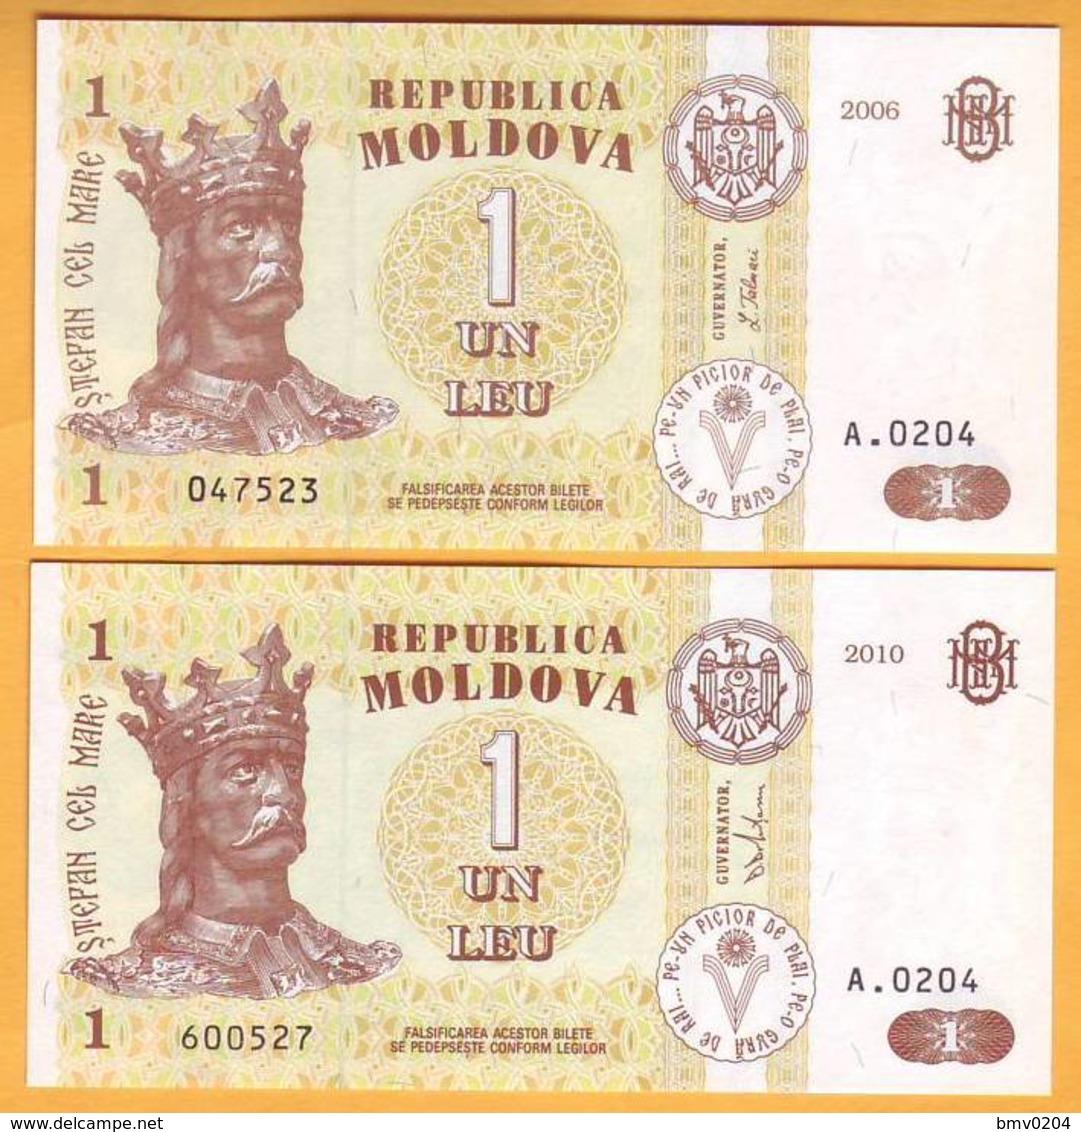 "2006 2010  Moldova ; Moldavie ; Moldau  ""1 LEI  2006 2010""  UNC One Lot  A.0204 - Moldavia"